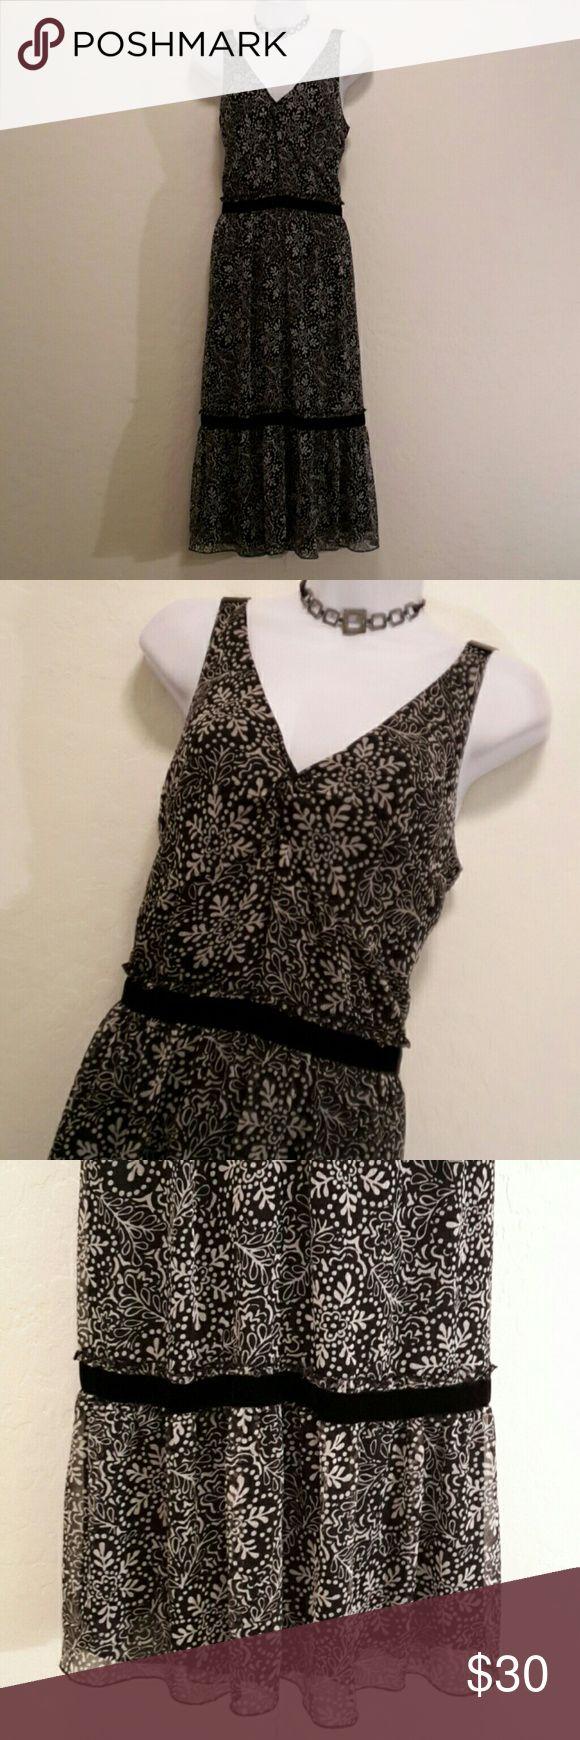 NWOT Anne Taylor LOFT Black Tan Flowy Sundress Never Worn, Stretch, Black Velvet Trim, Lined, Hack Zipper, Ruffle Hem, V-neck, Cool Print & Colors, Accessories not included. Dresses